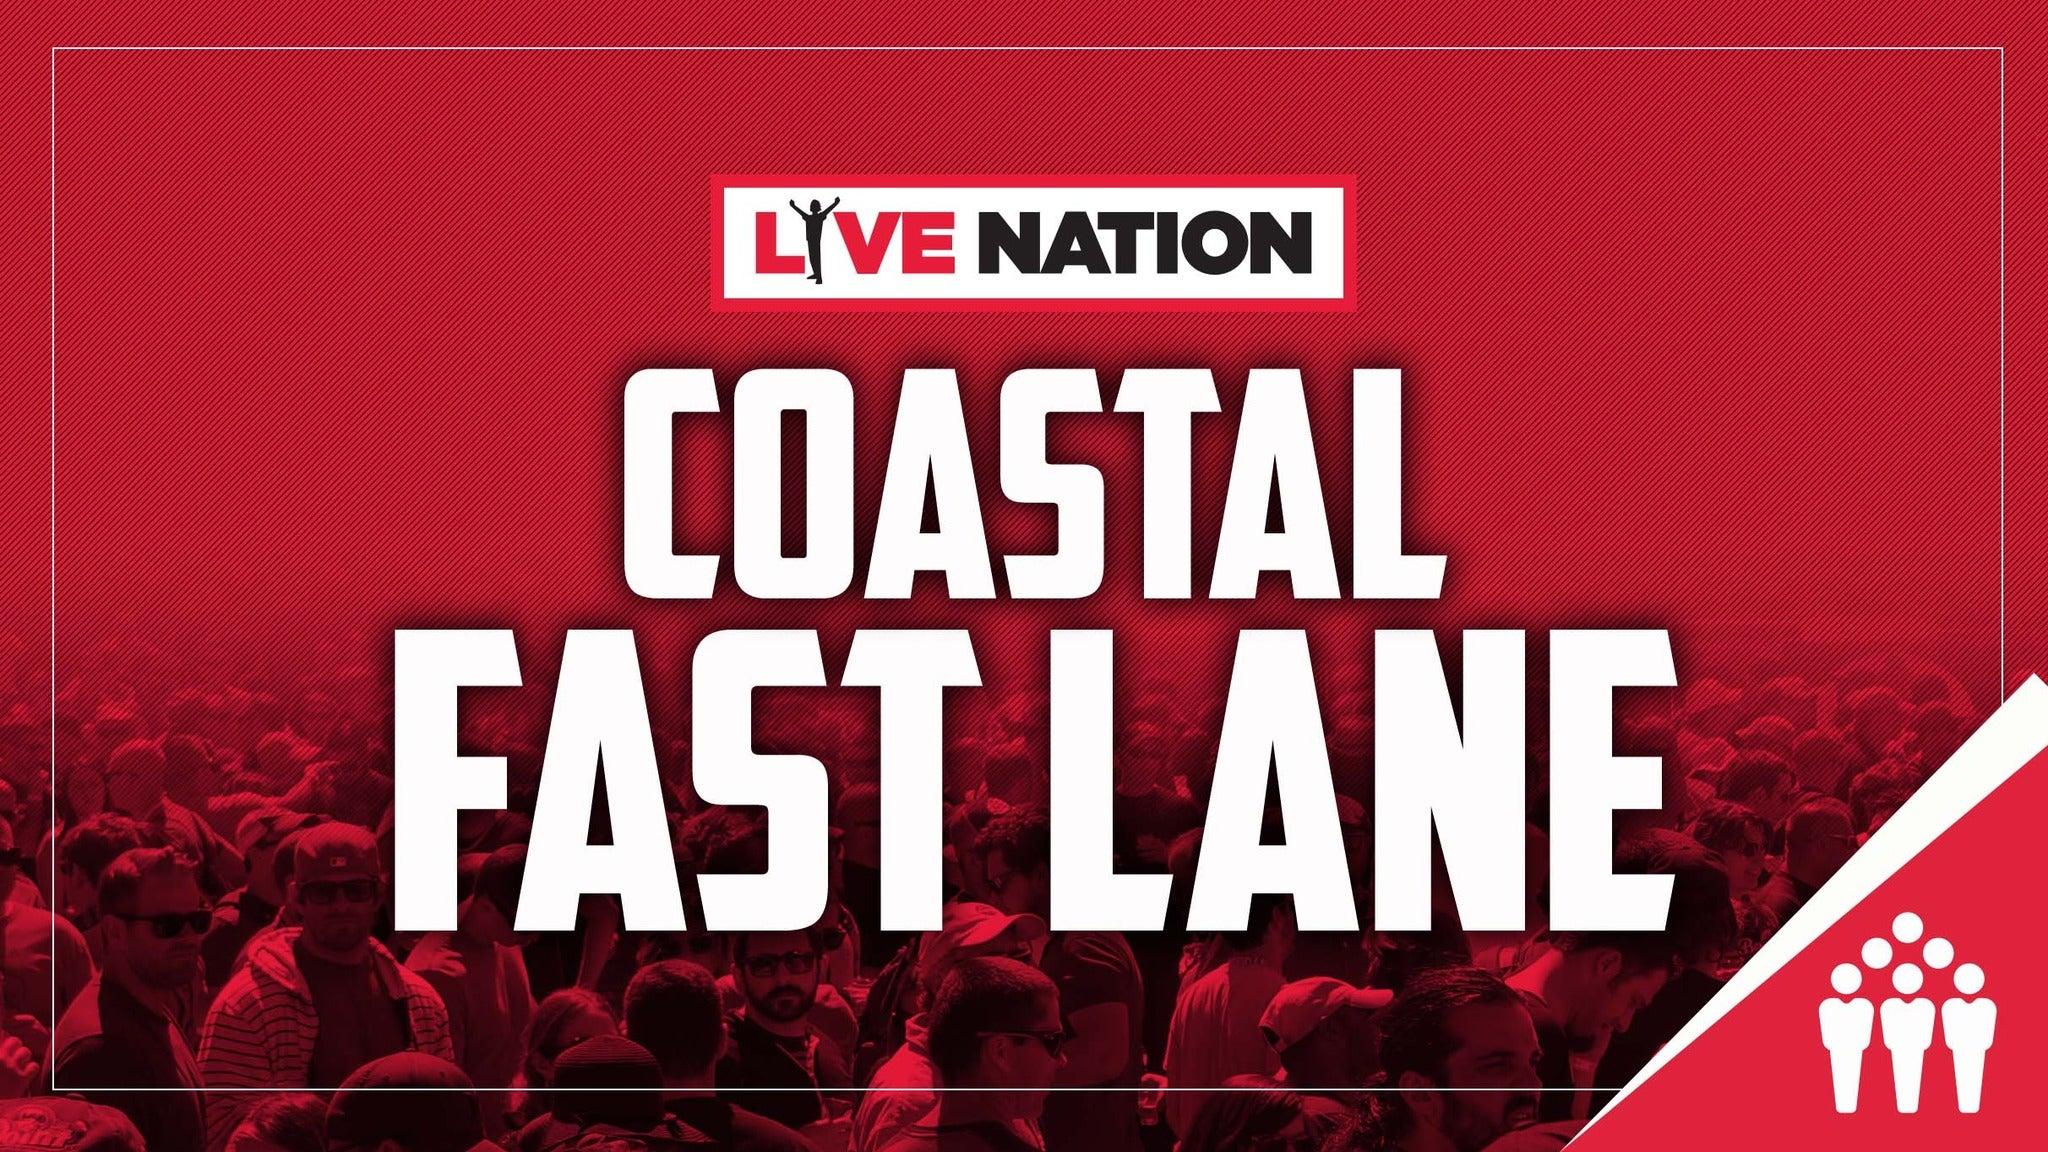 Coastal Fast Lane Access: Dave Matthews Band